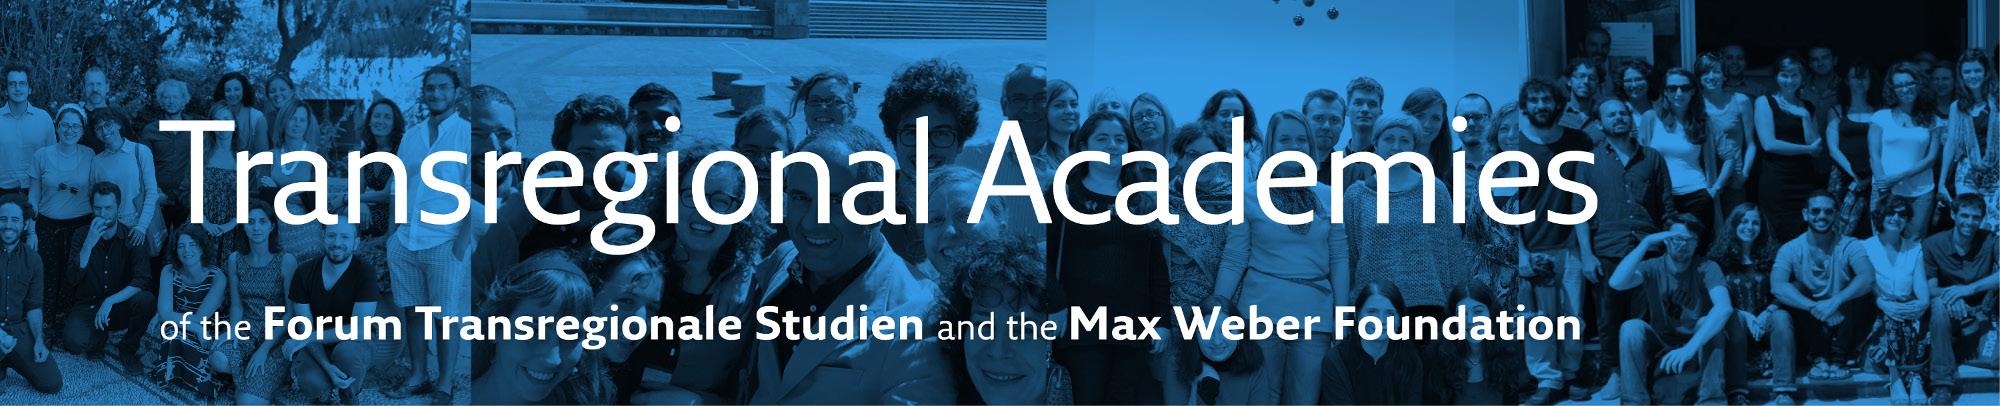 Transregional Academies